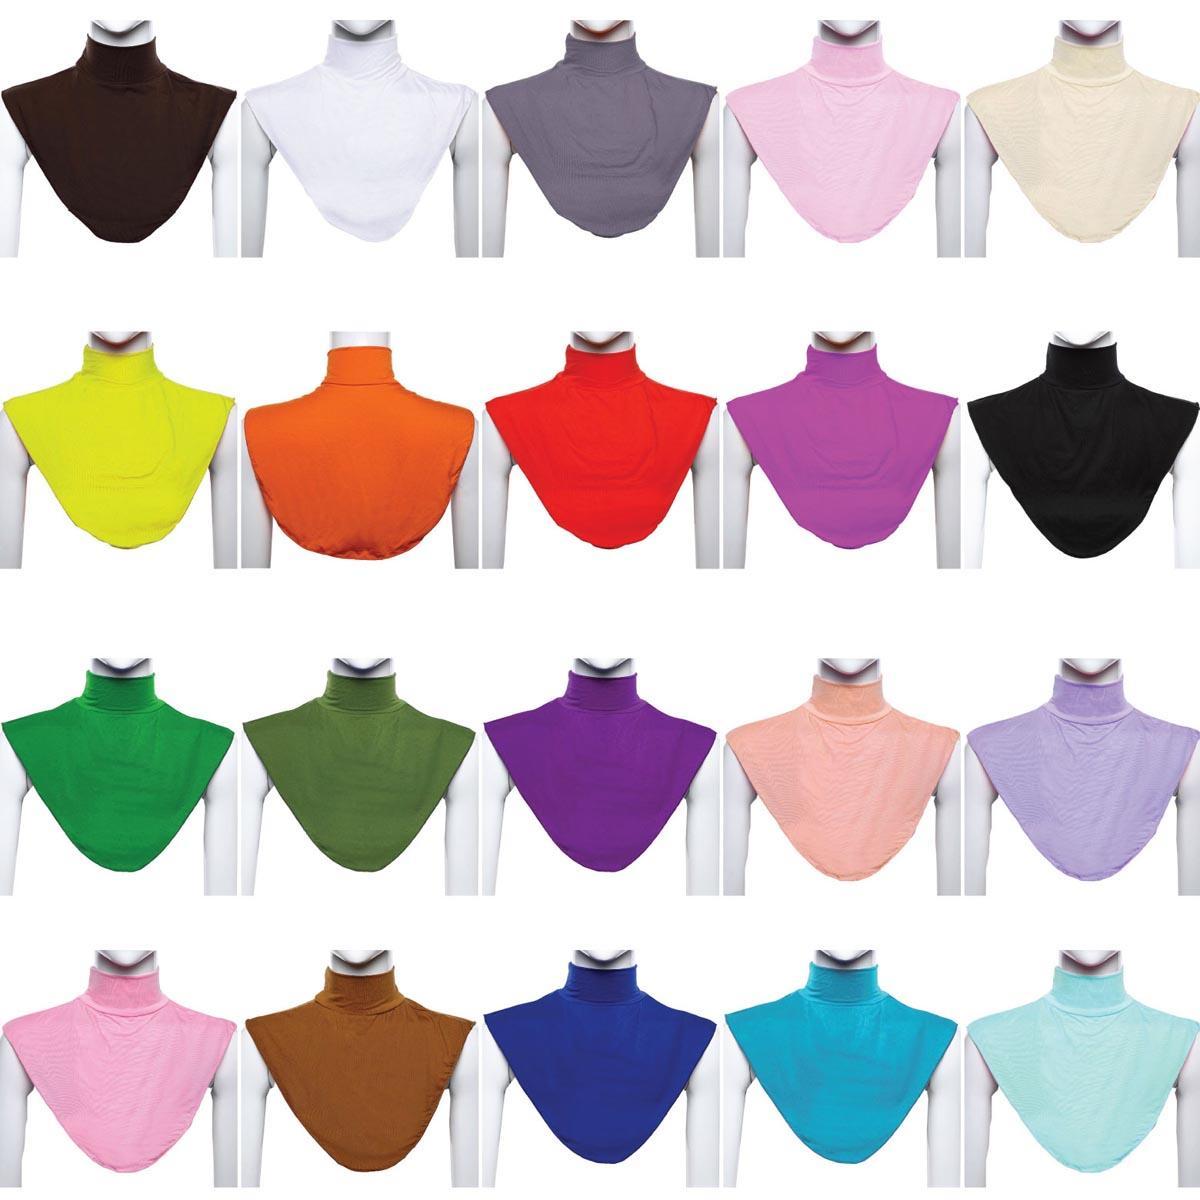 Women's Modal False Collar Hijab Moslem Islamic Neck Cover Loop   Scarf   Muslim Accessories Turtleneck Collar   Wrap   Apparel